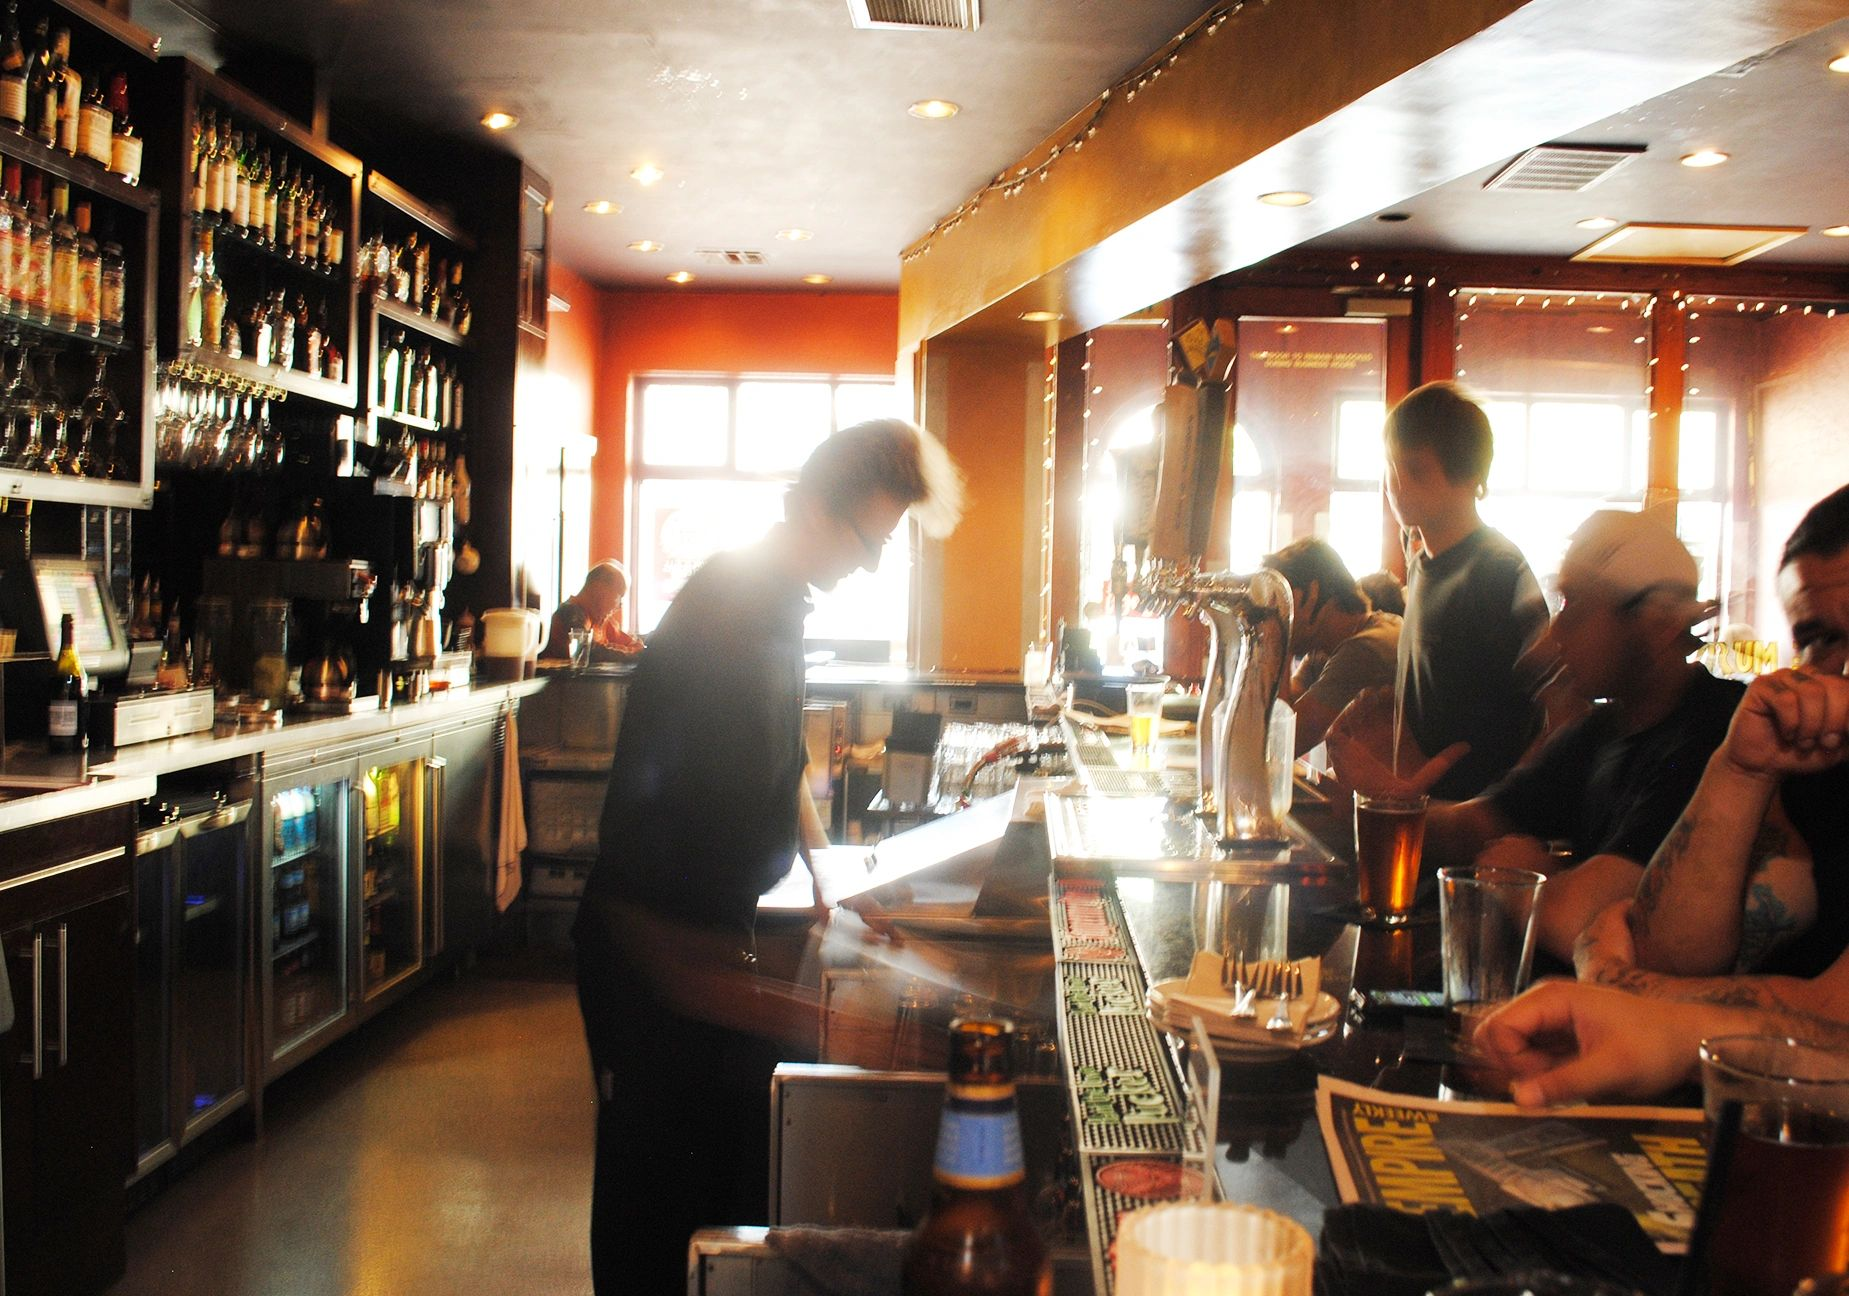 The Press Restaurant Restaurant Bar With Live Music